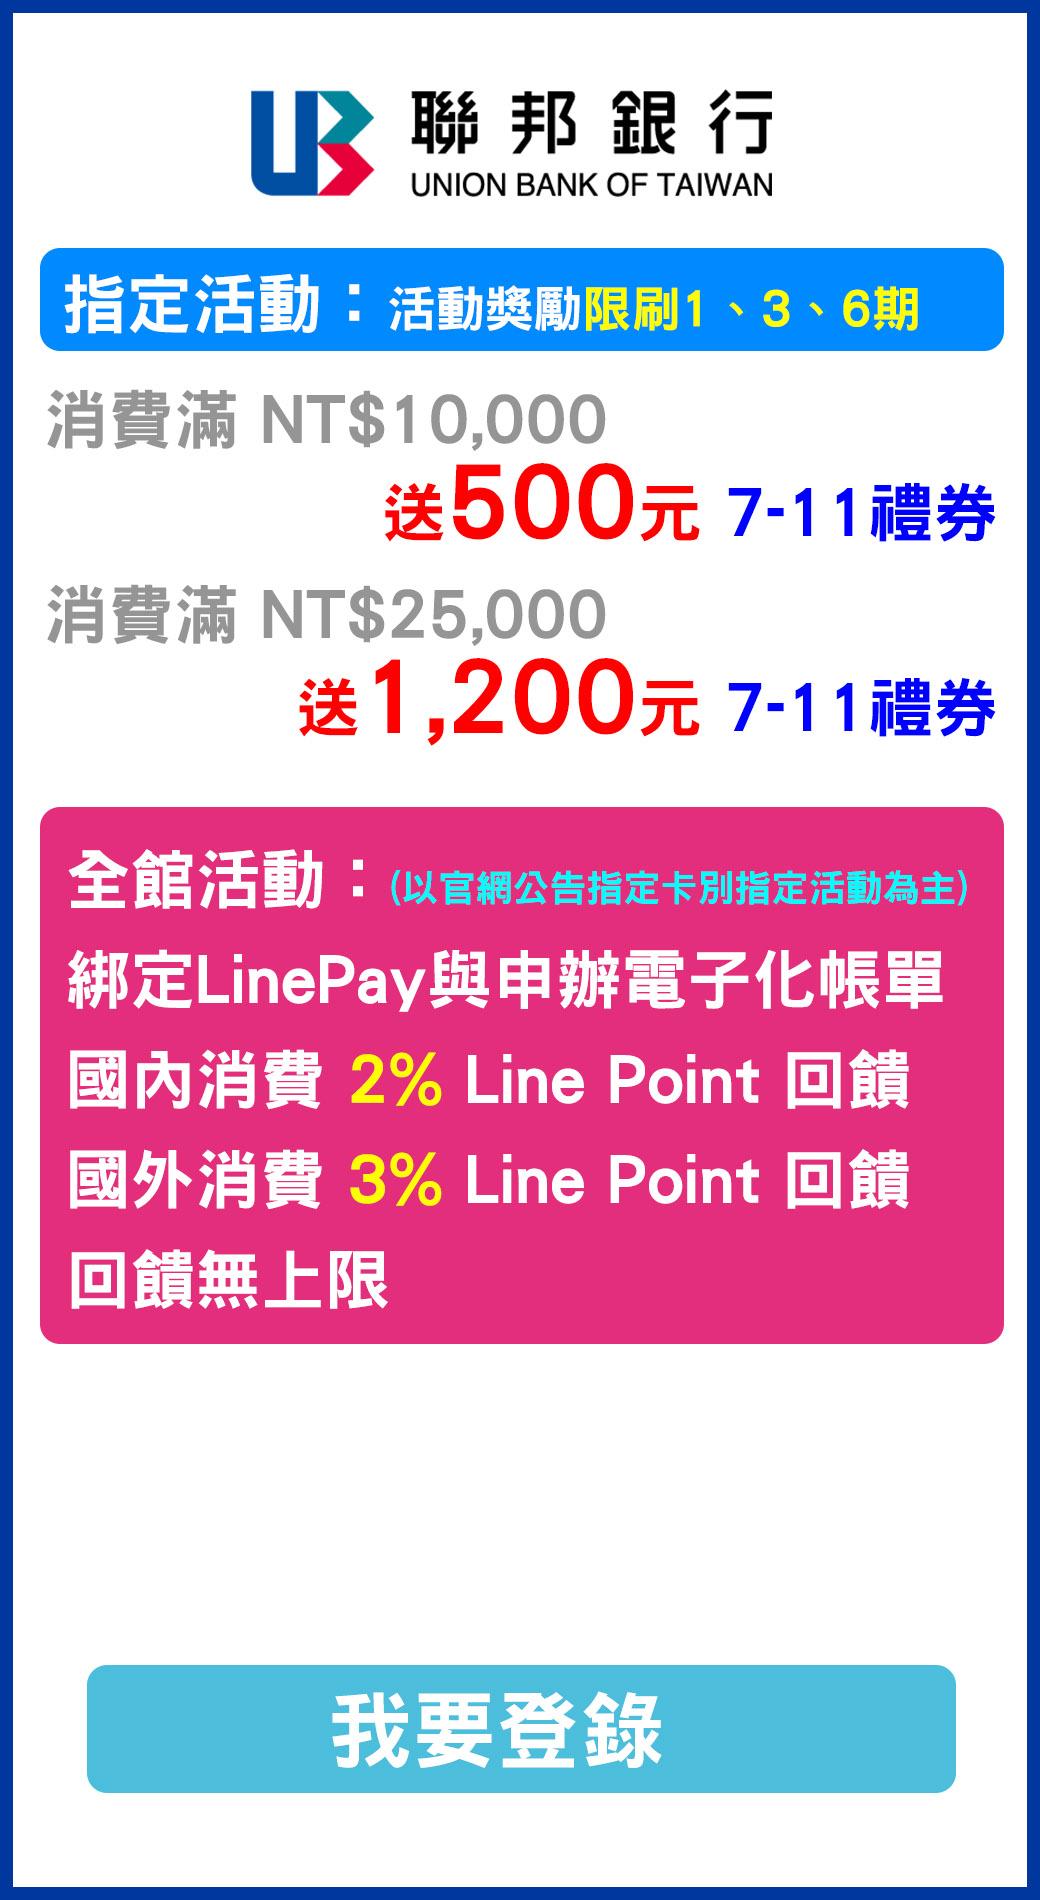 http://forum.sinya.com.tw/upload/attachment/2020/5efbfc91237143530.jpg